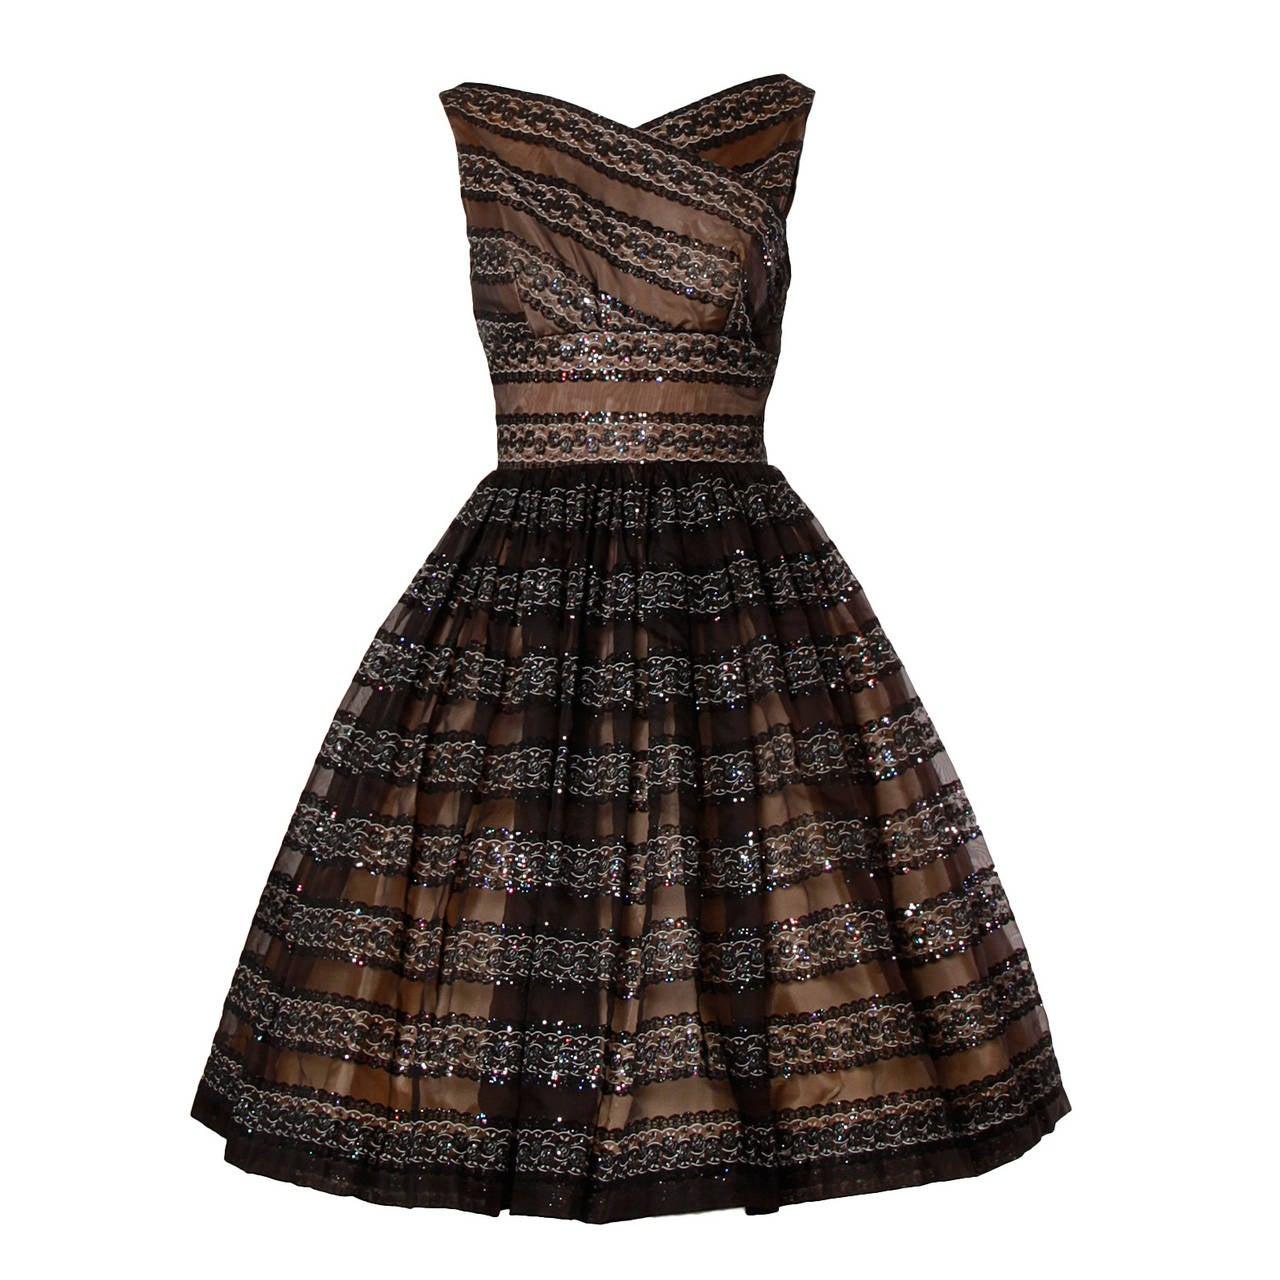 1950s Vintage Flocked Velvet + Glitter Nude Illusion Cocktail Dress ...